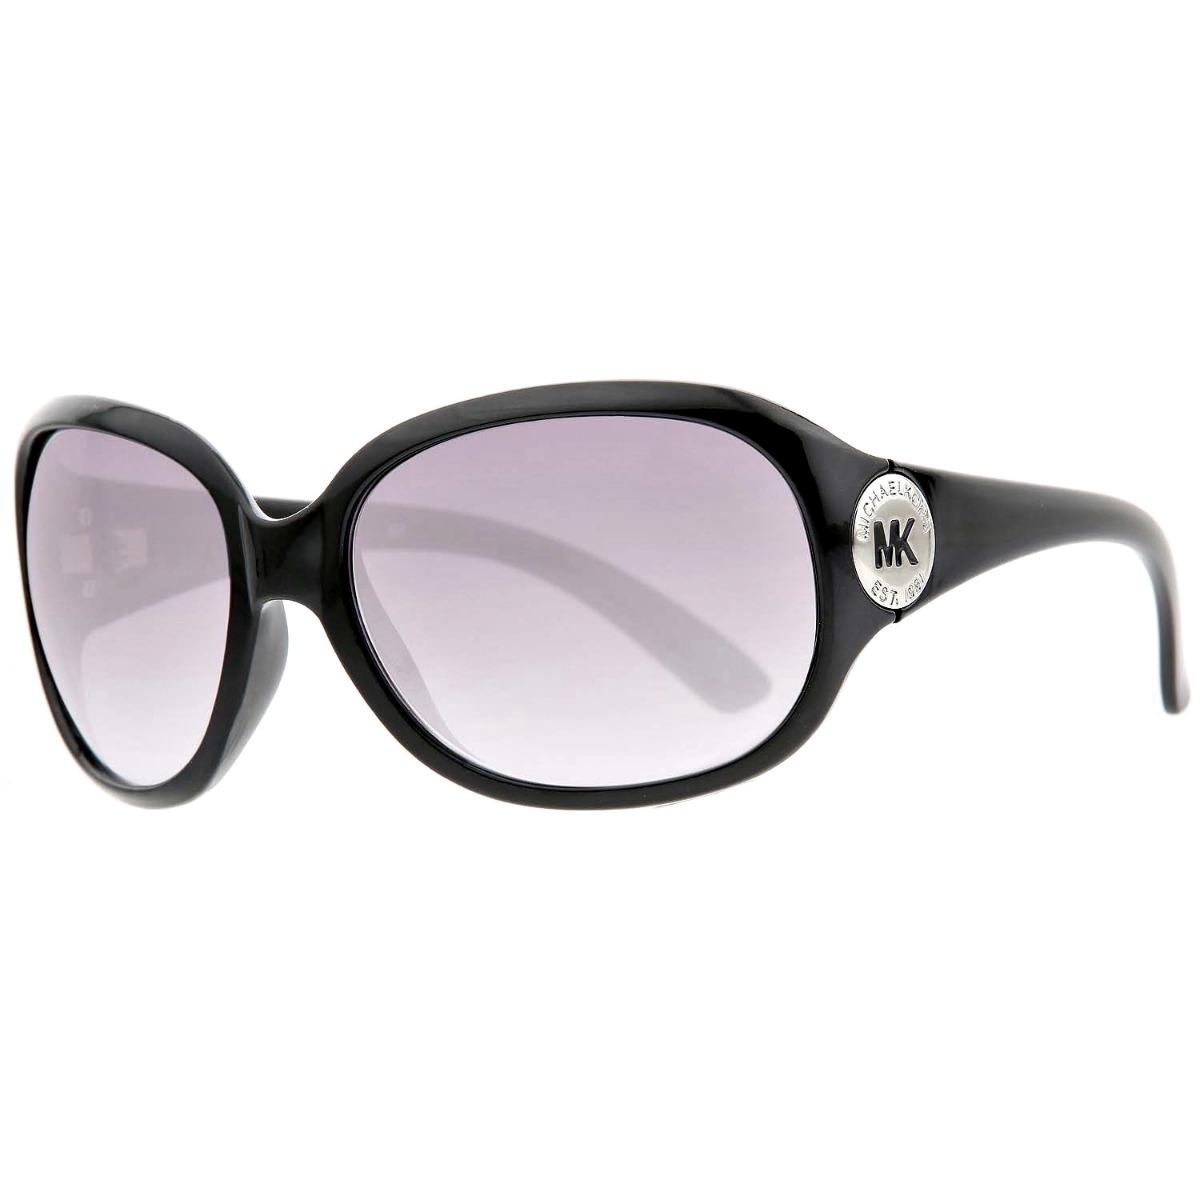 d0ad70b09 óculos de sol feminino michael kors original preto prata. Carregando zoom.